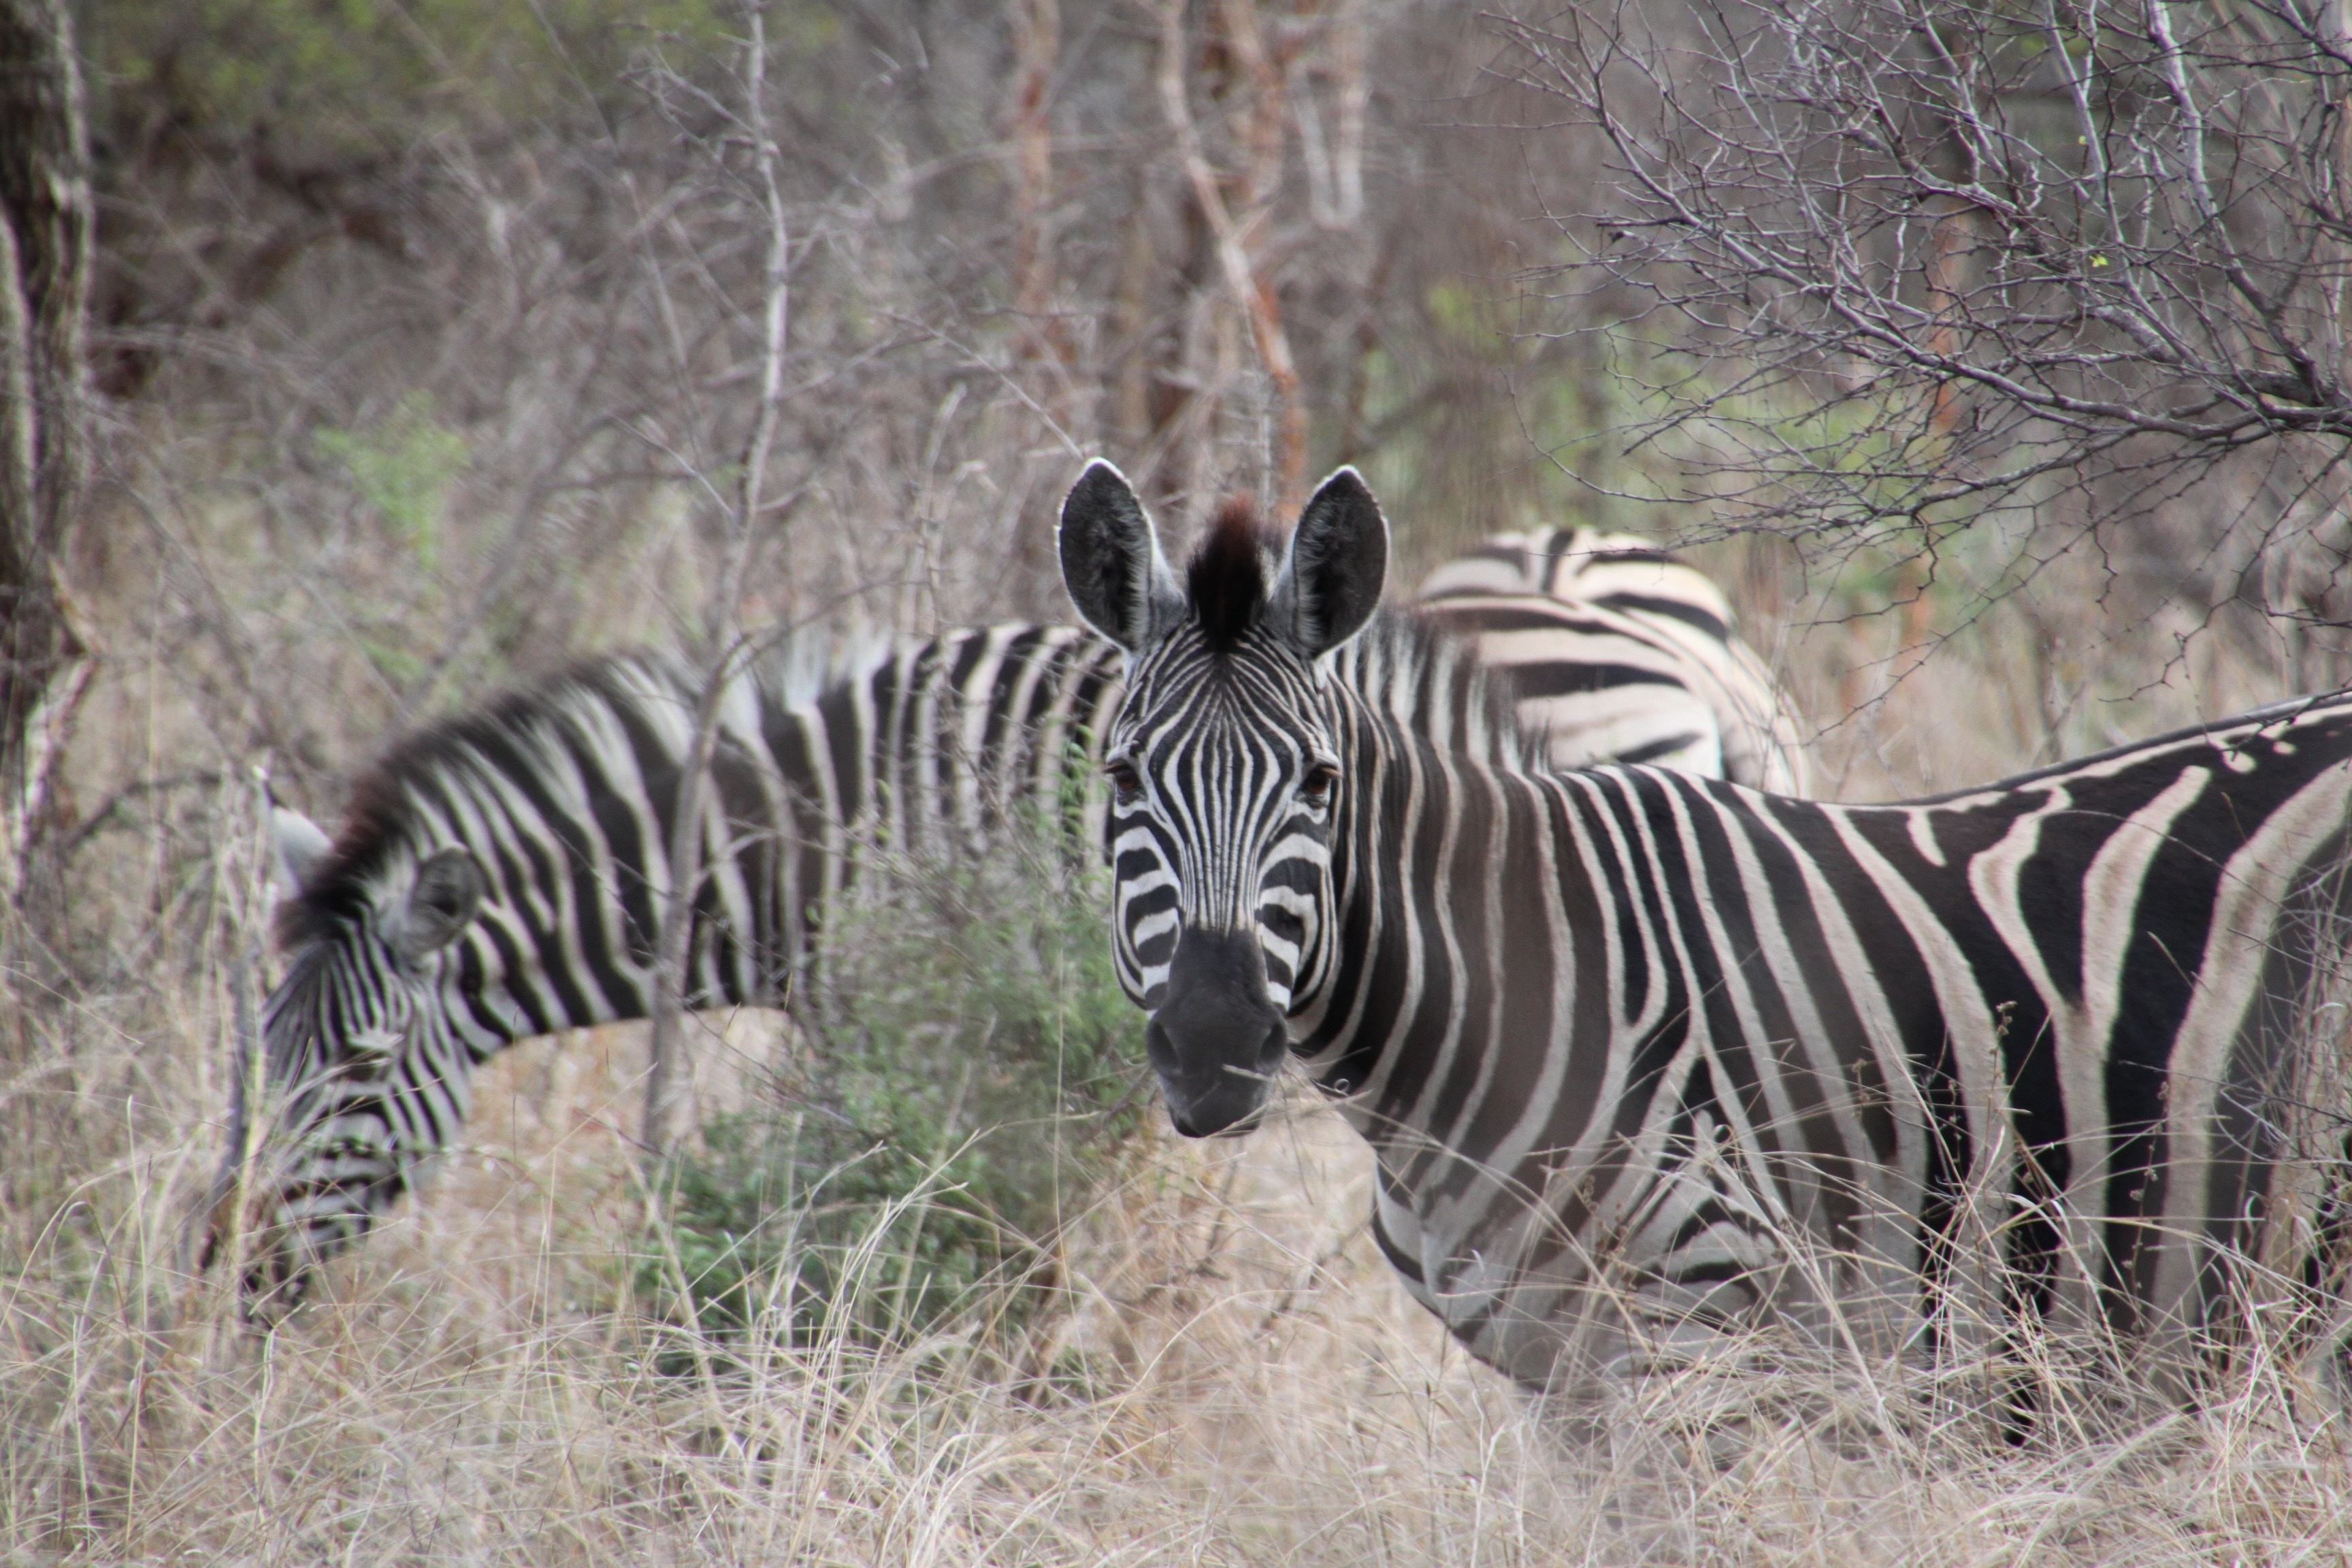 zebra wildlife south africa - HD3456×2304